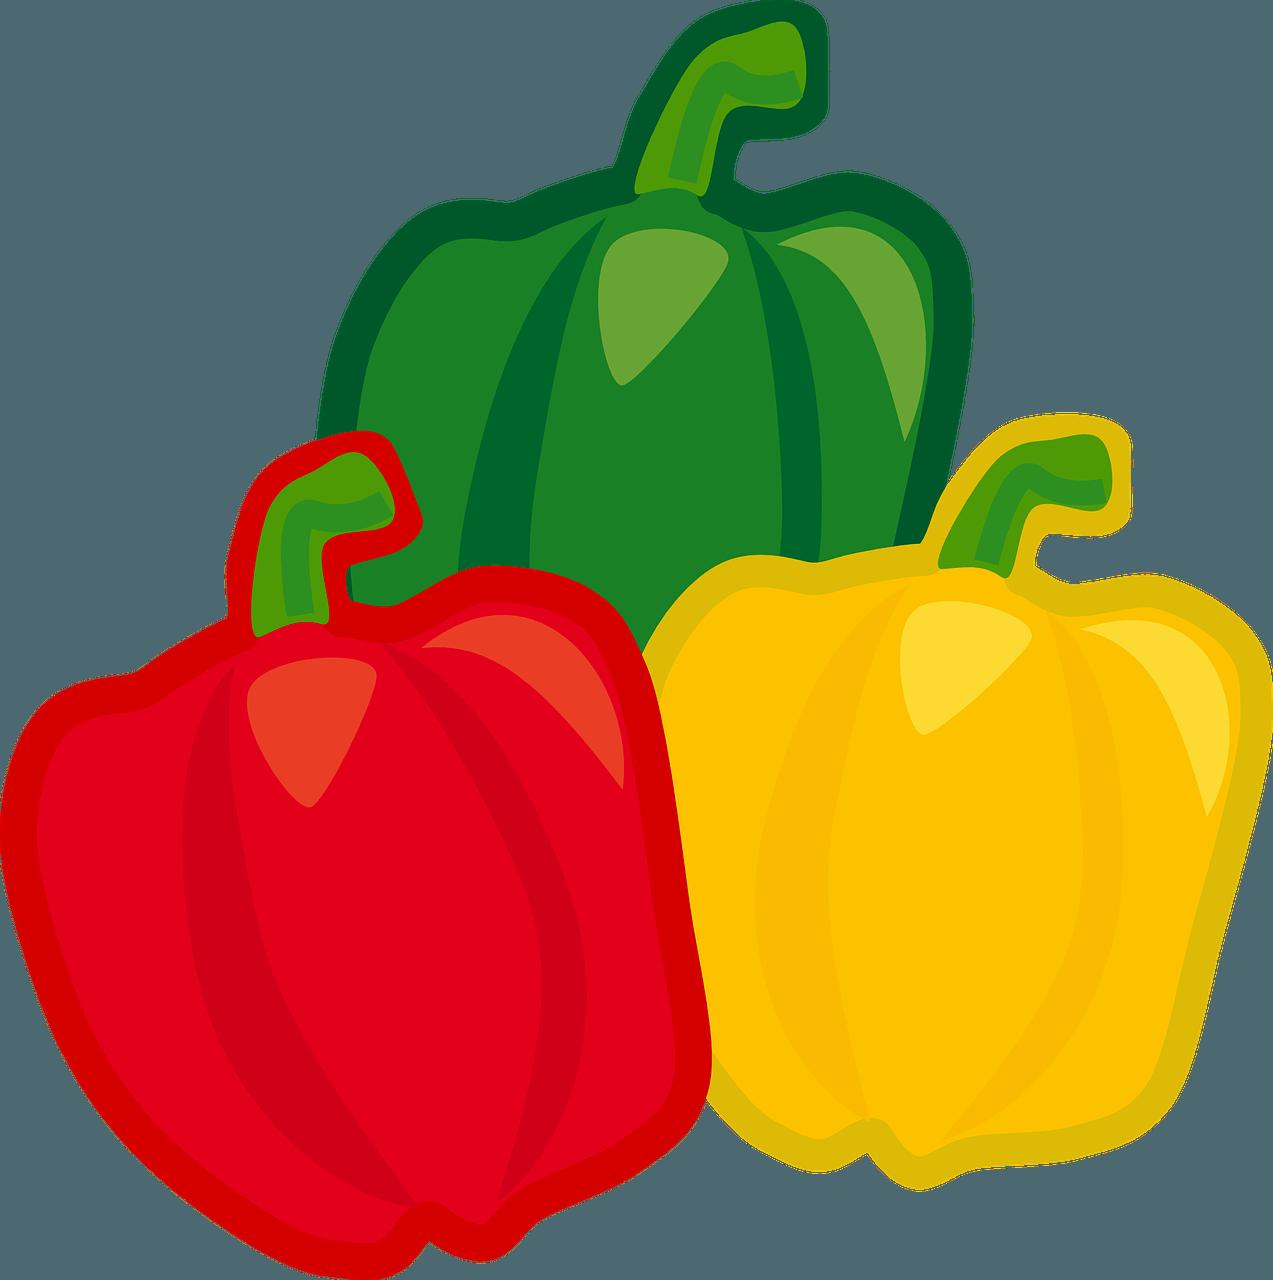 bell-pepper-310162_1280